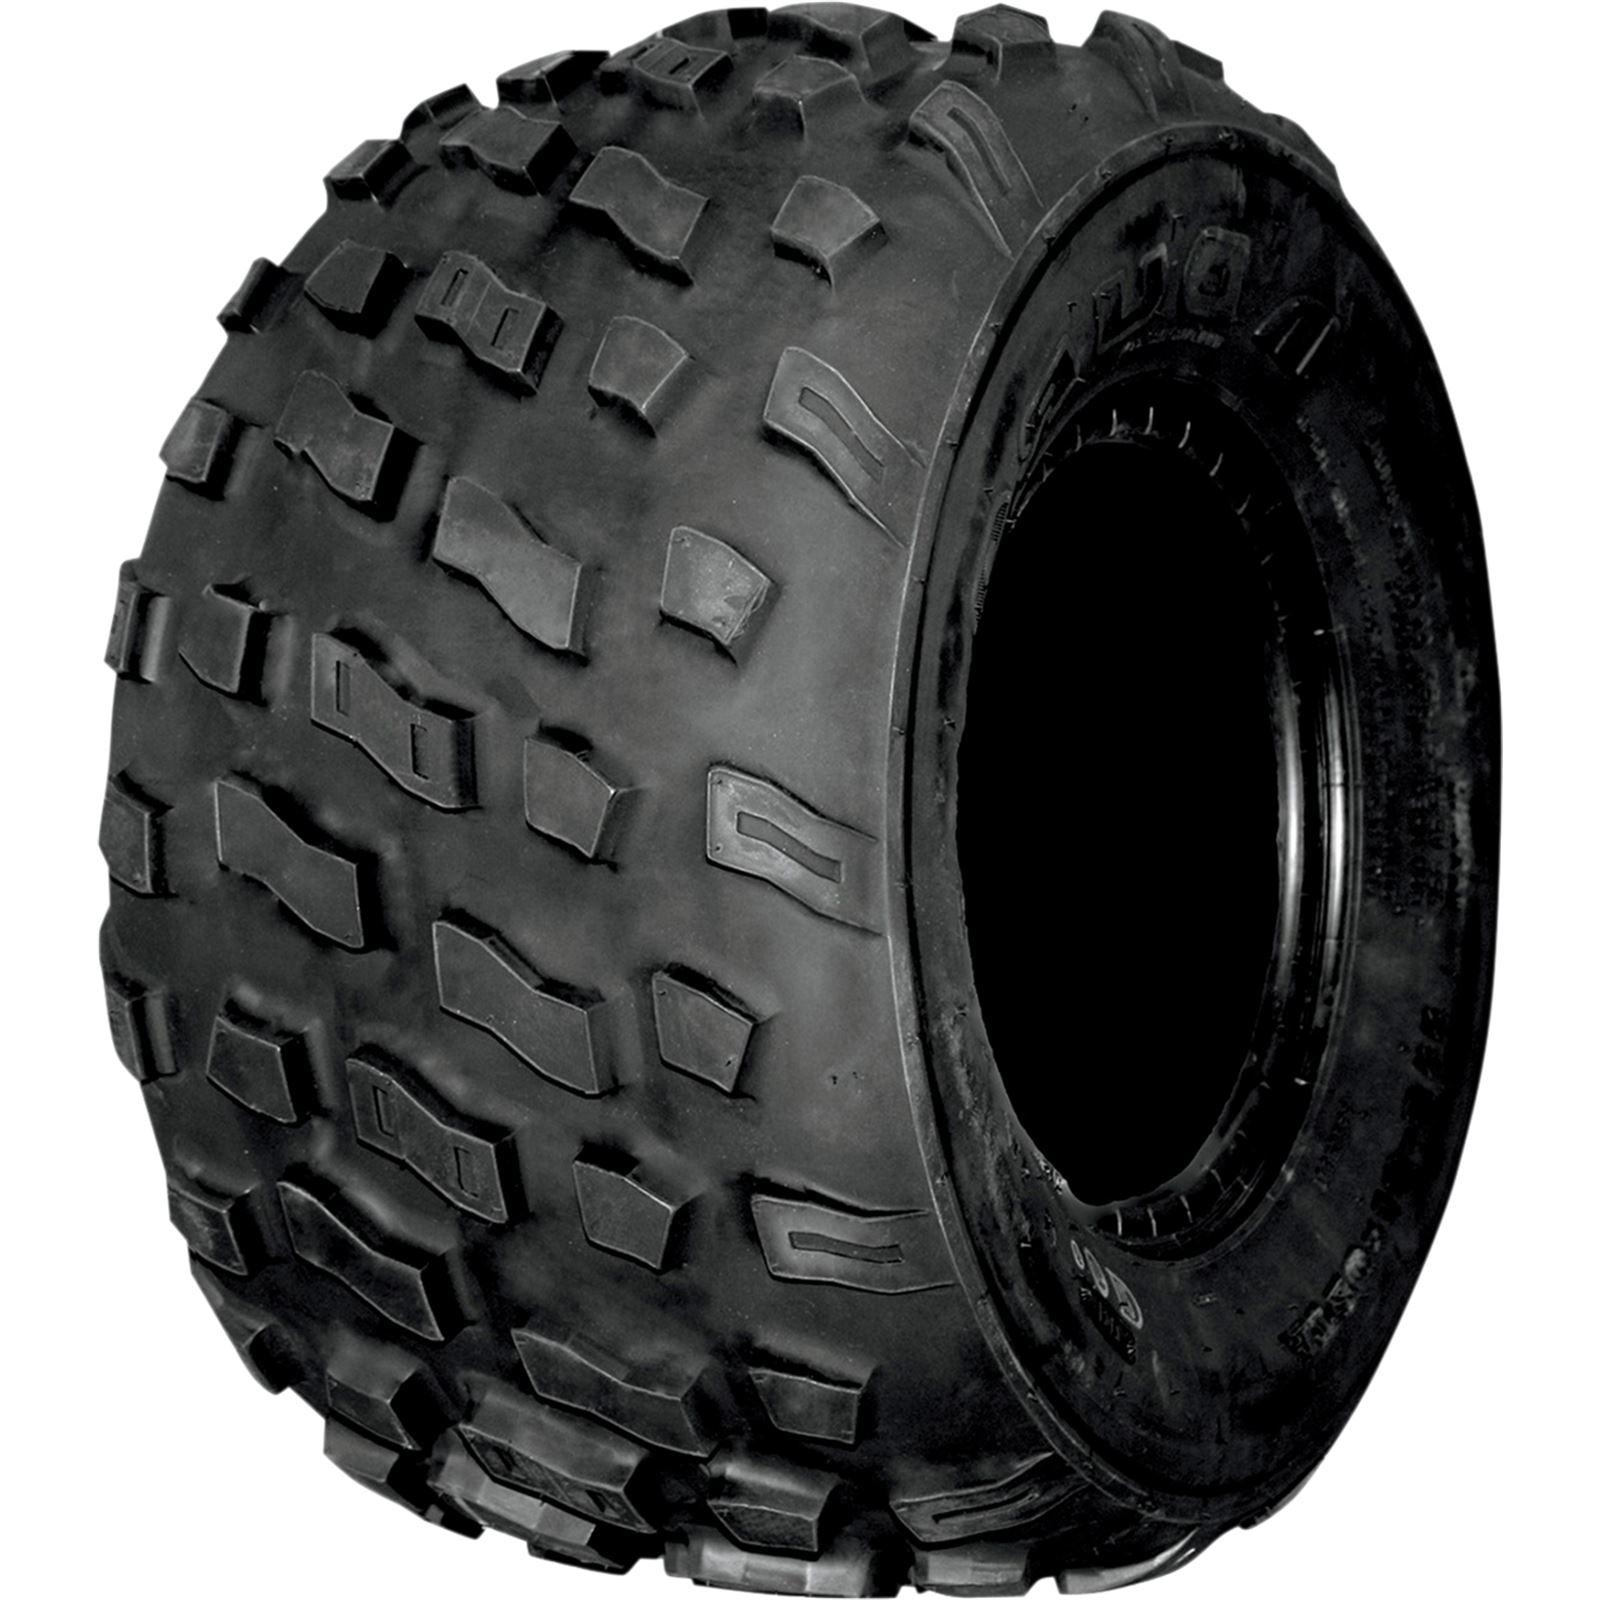 Duro Tire Tire - DIK778A - 20X10-9 - 4 Ply